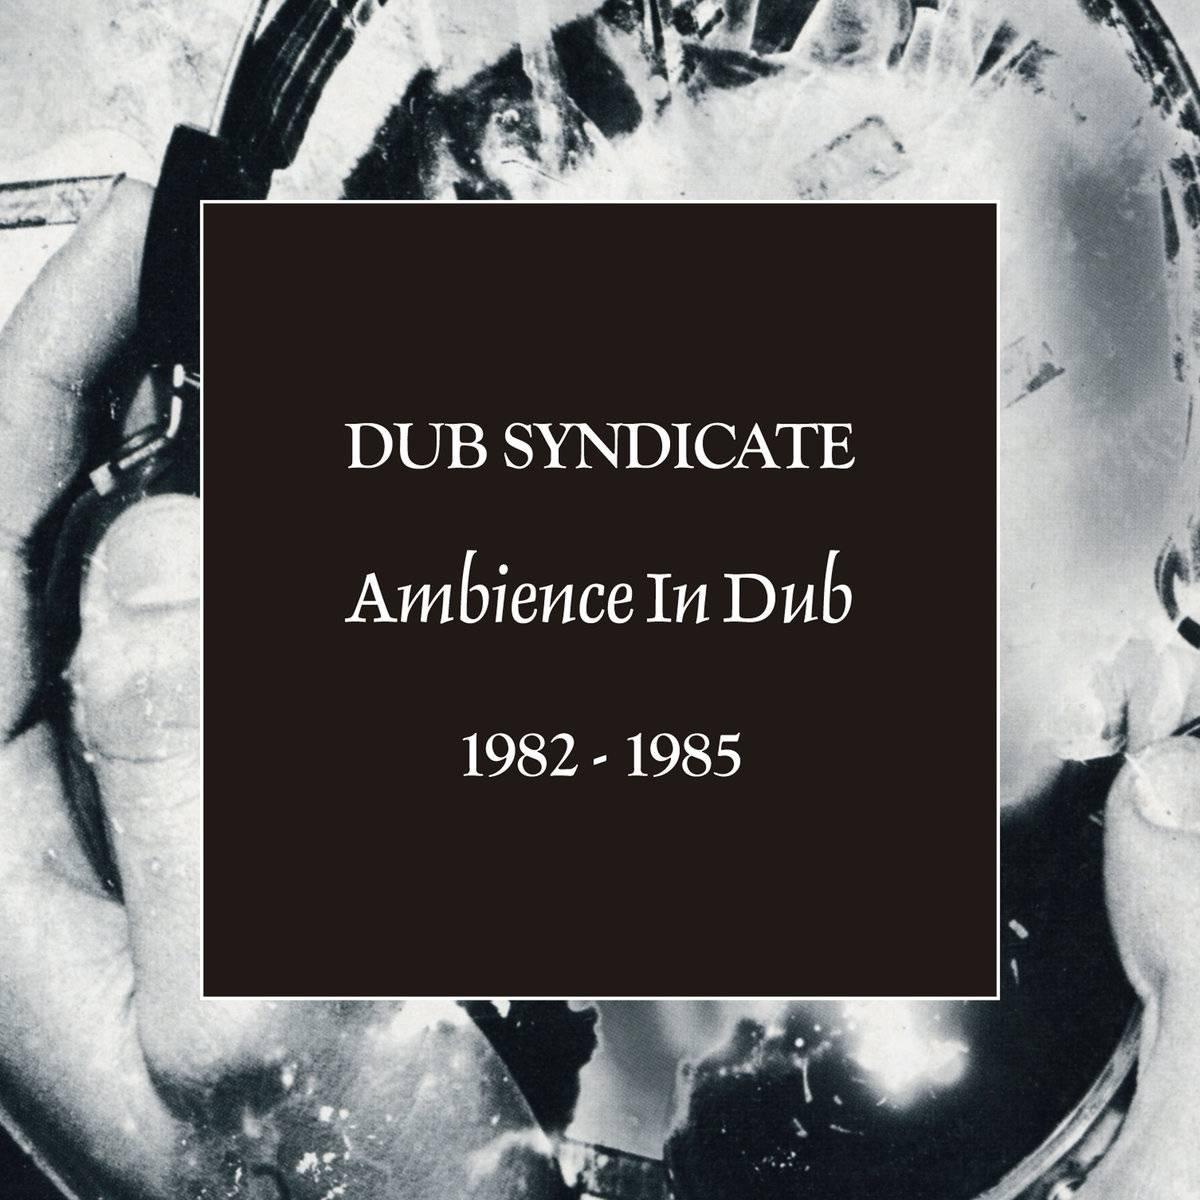 Dub Syndicate - Ambience In Dub 1982-1985 (2017) [5CD Box Set]